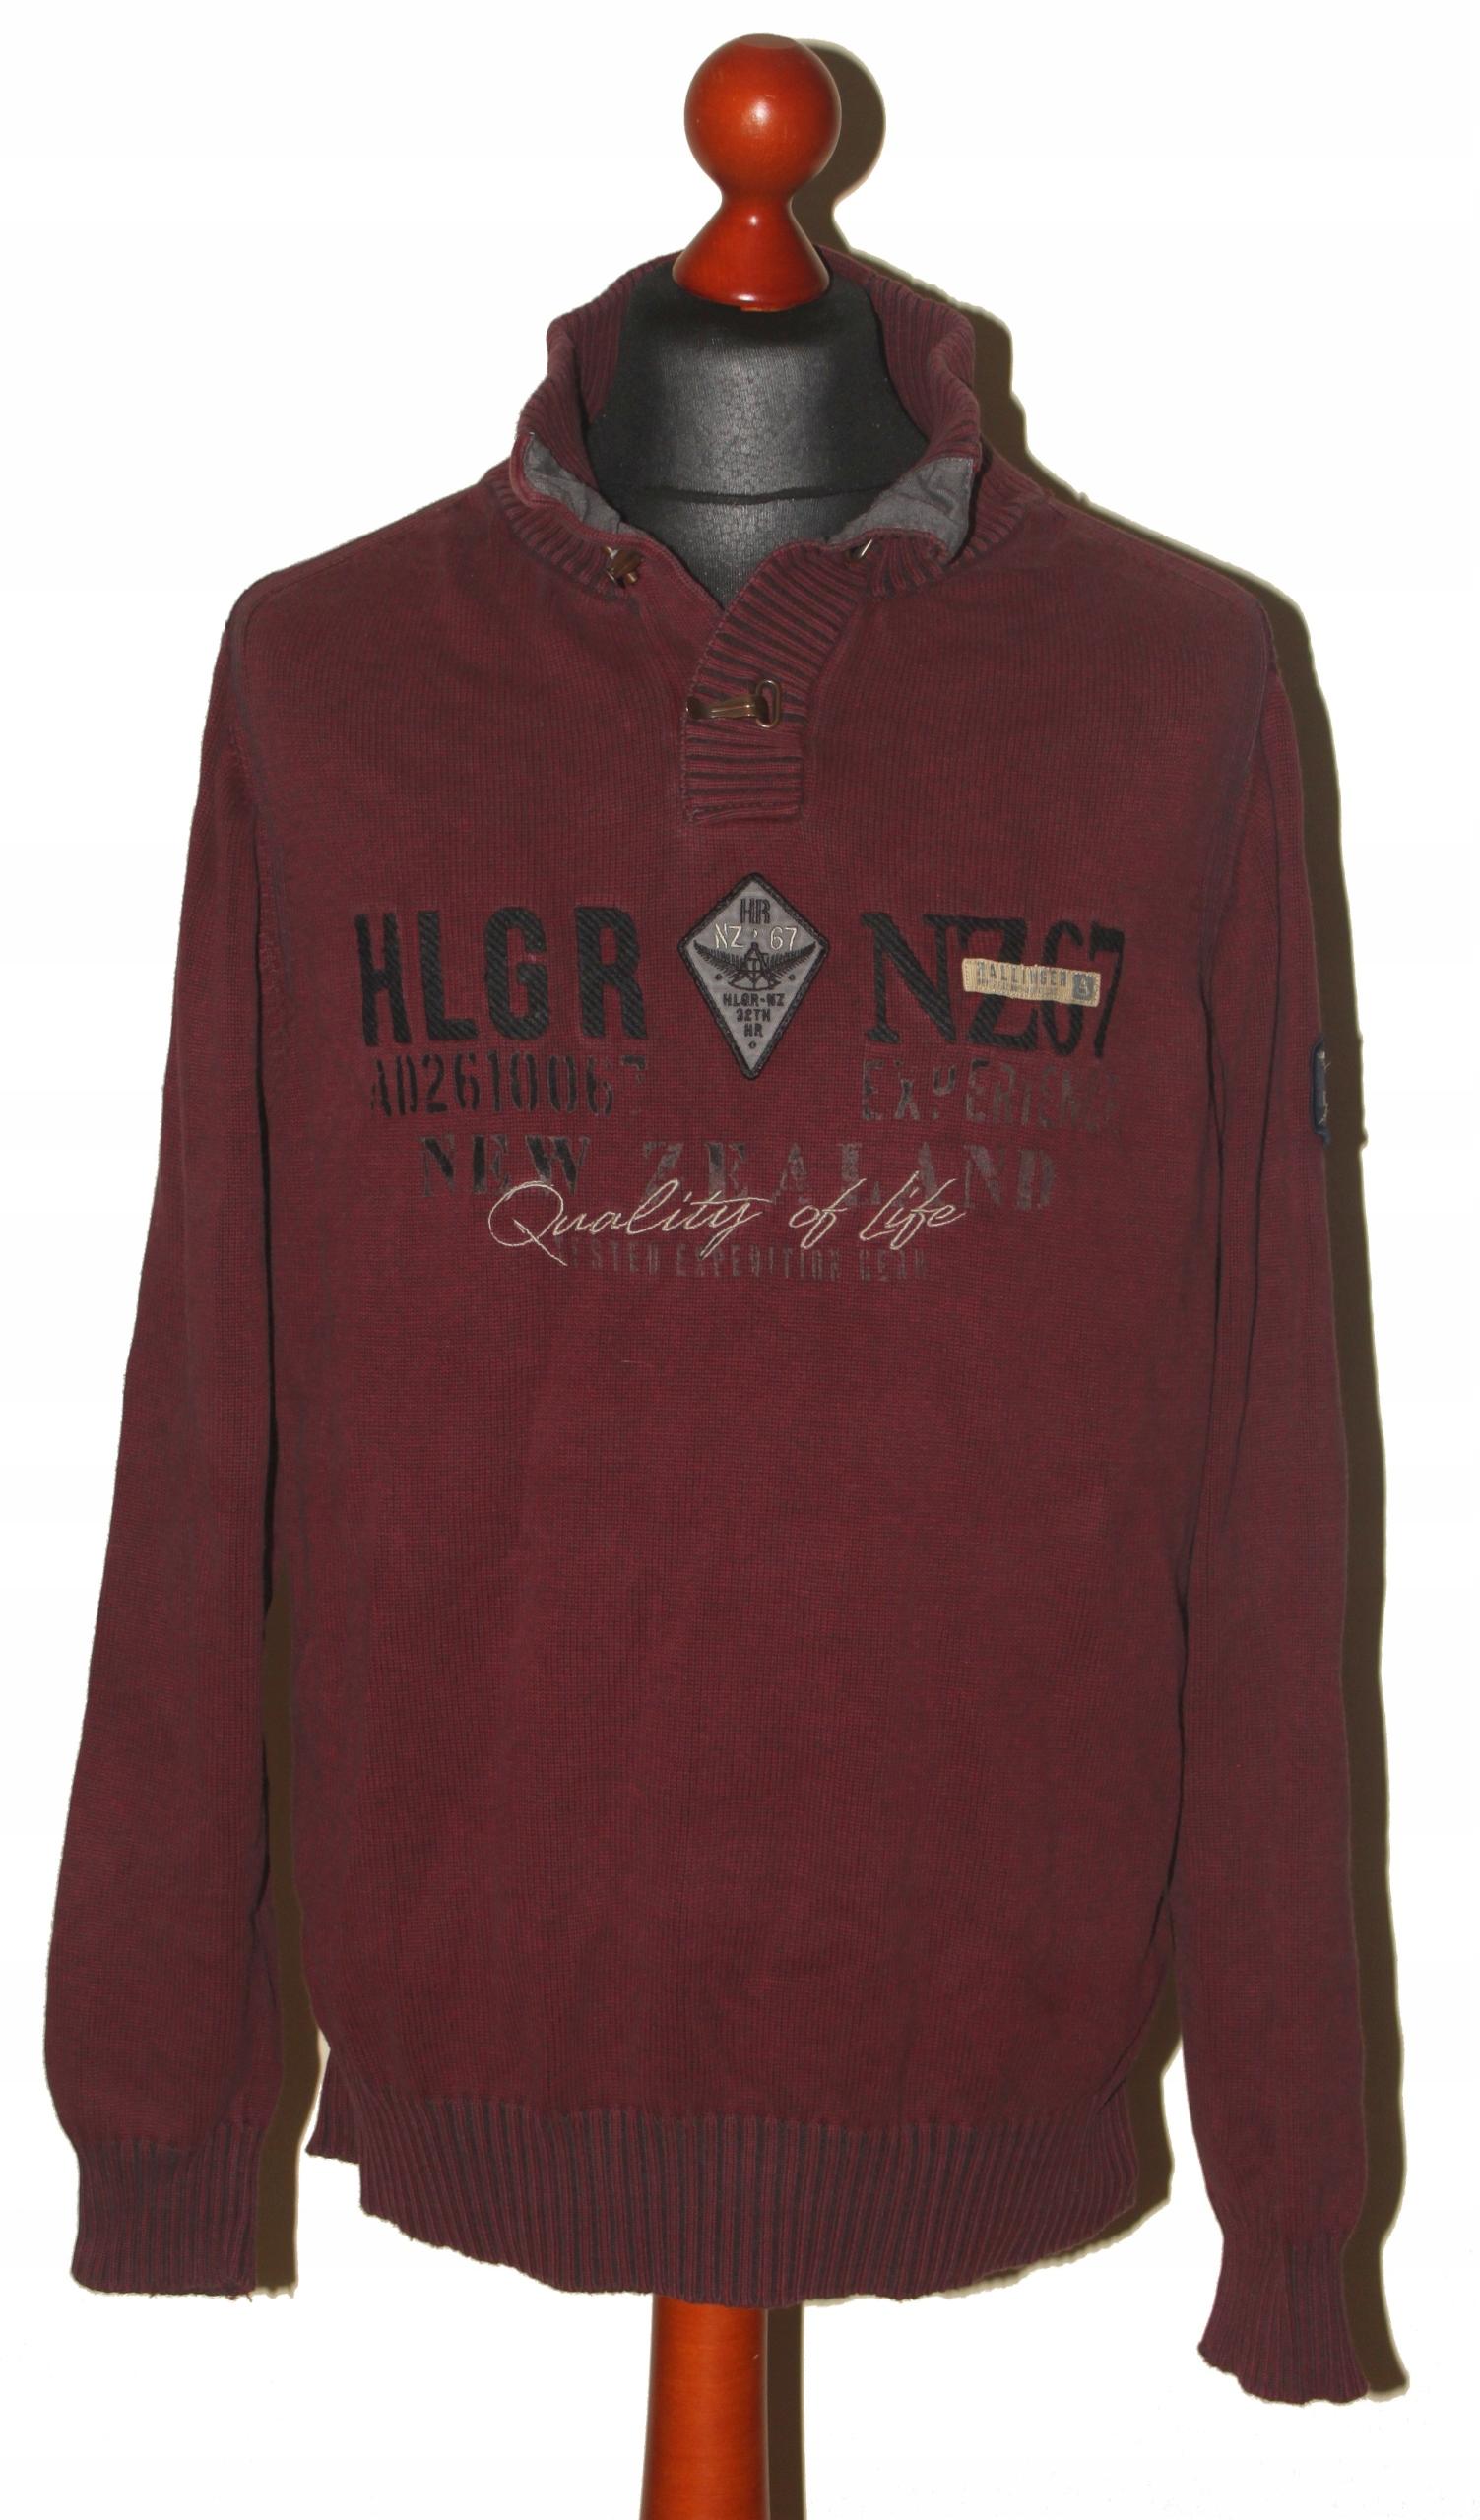 Hallinger sweter męski rozm. L pachy: 57 cm